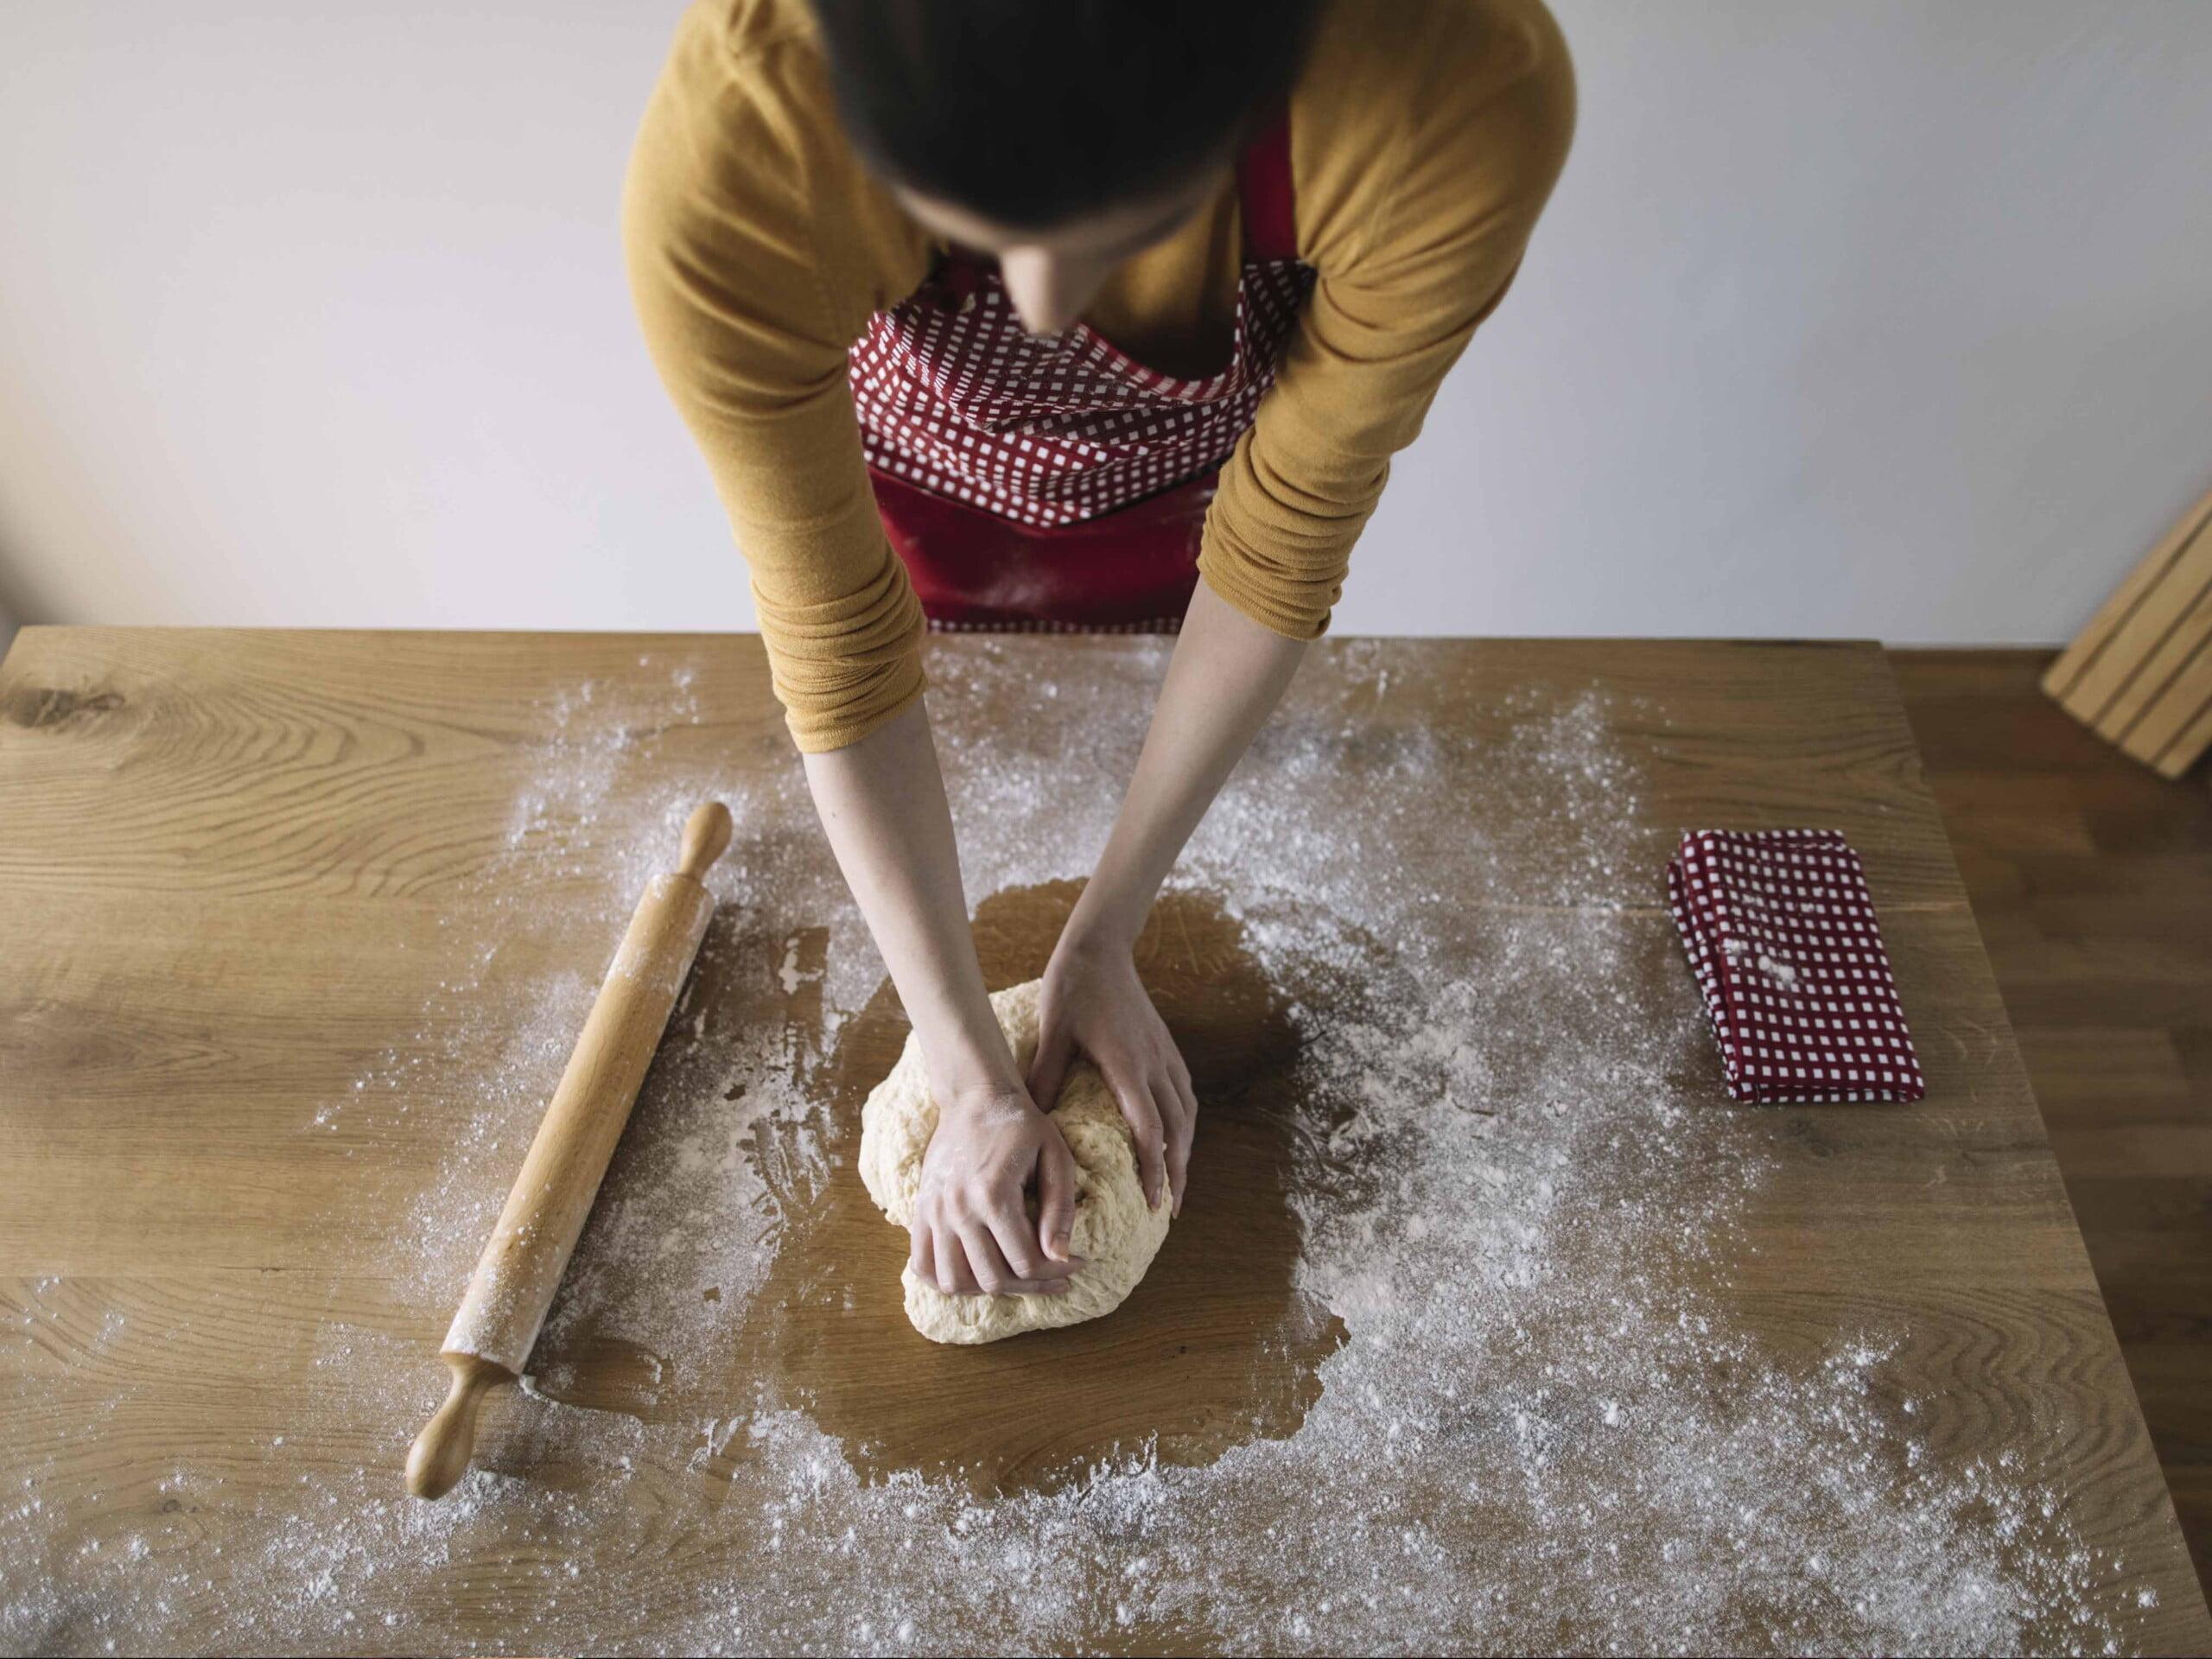 bread in a pot knead into a dough